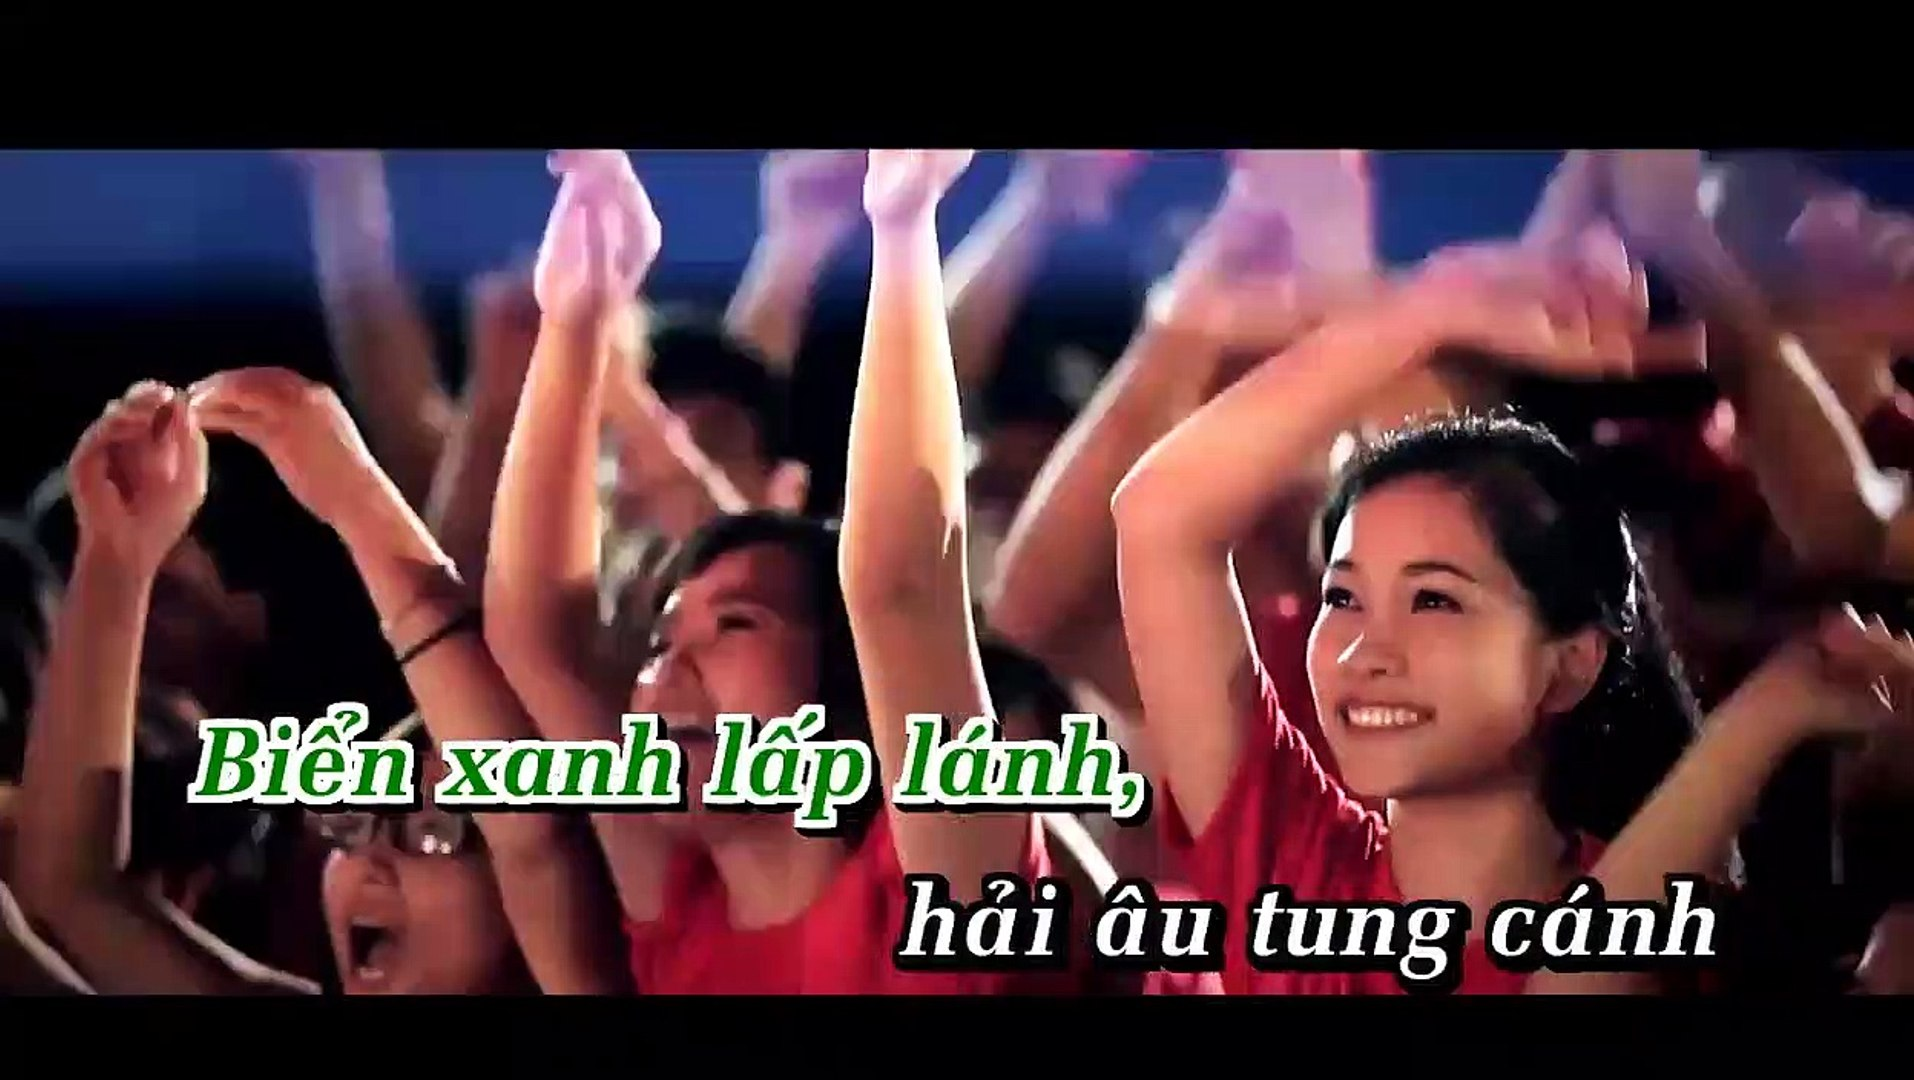 [Karaoke] Bay Qua Biển Đông - M4U [Beat]